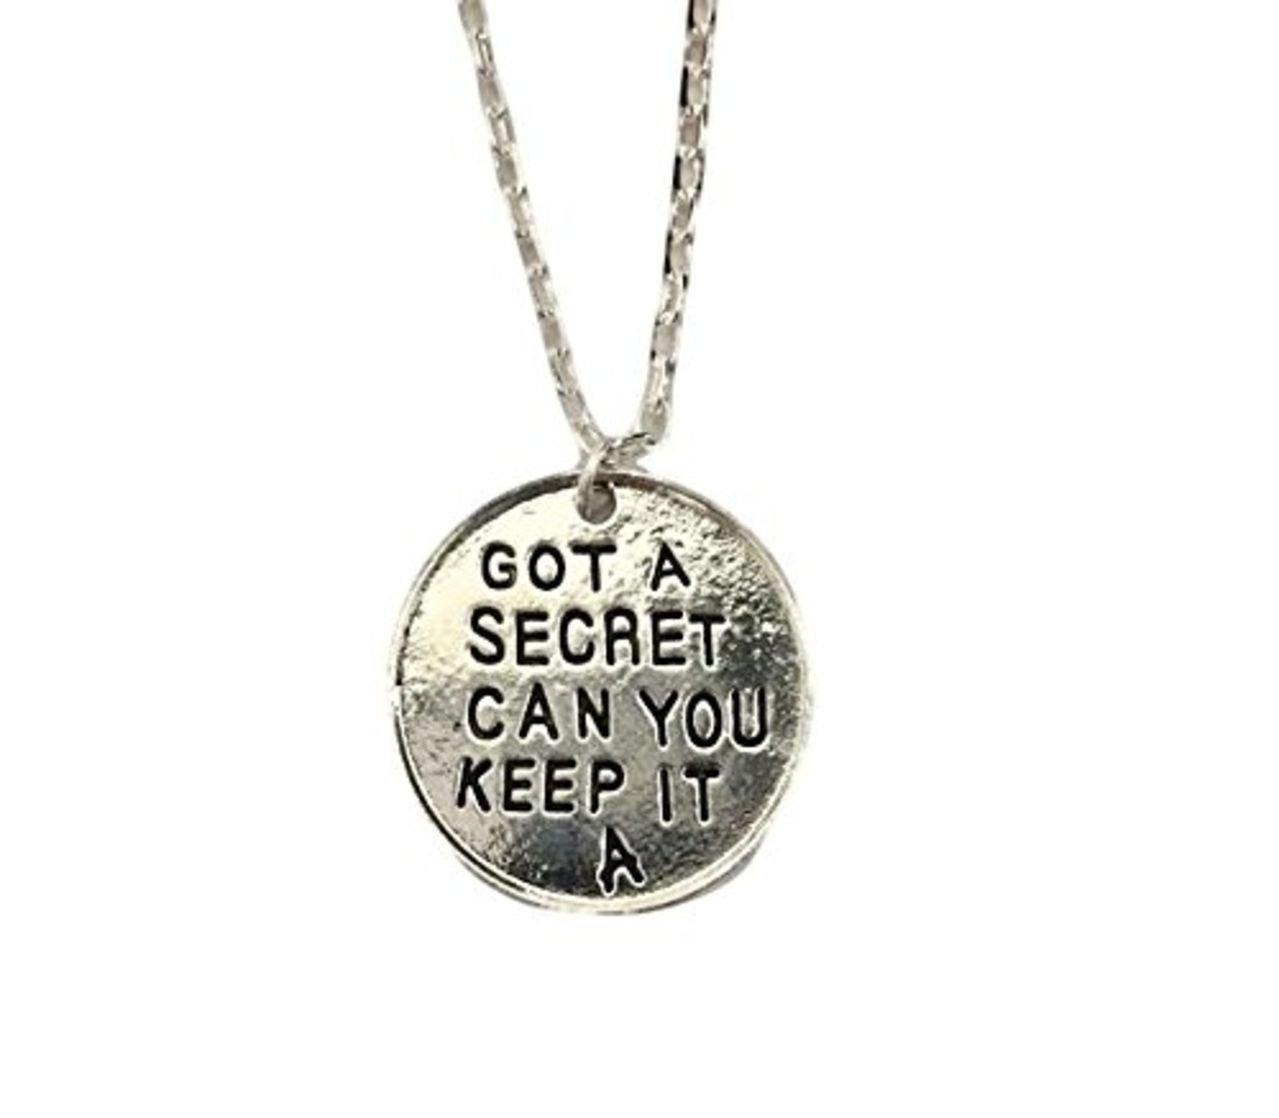 Buddy's Memorabilia 13 Pretty Little Liars GOT A Secret CAN You Keep IT A Pendant Necklace w/ 20'' Chain